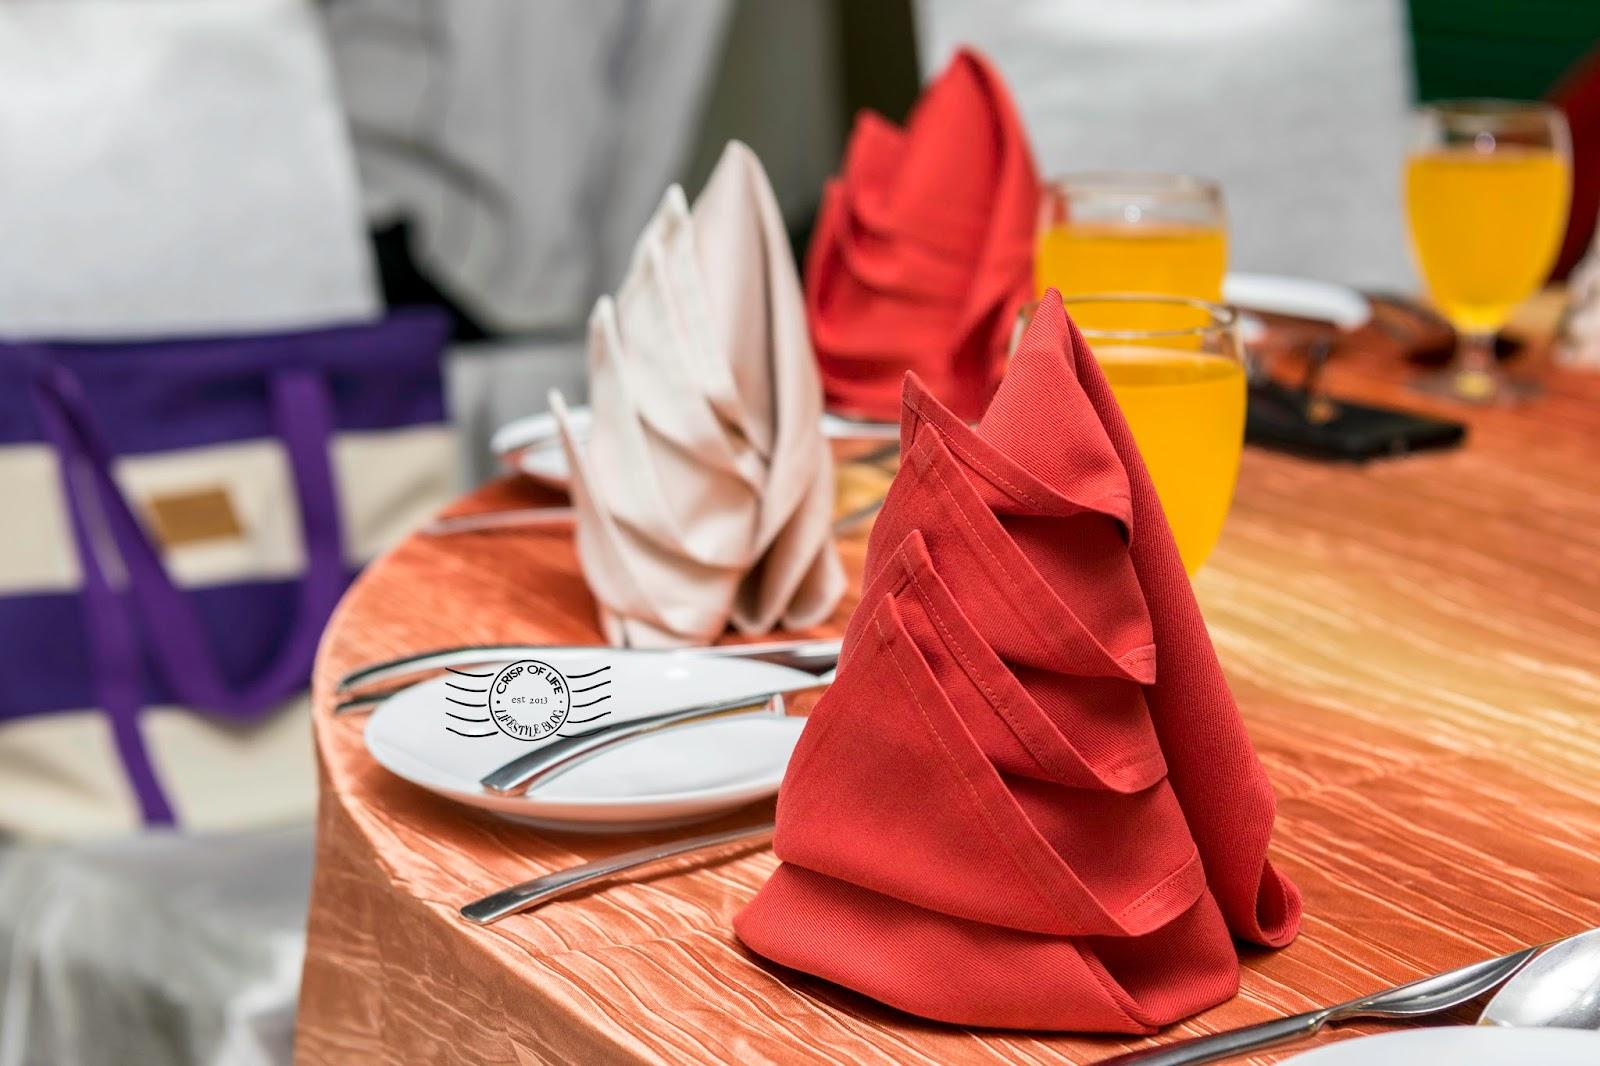 Christmas Eve and New Year's Eve Buffet Dinner @ Sunway Hotel Georgetown and Sunway Hotel Seberang Jaya